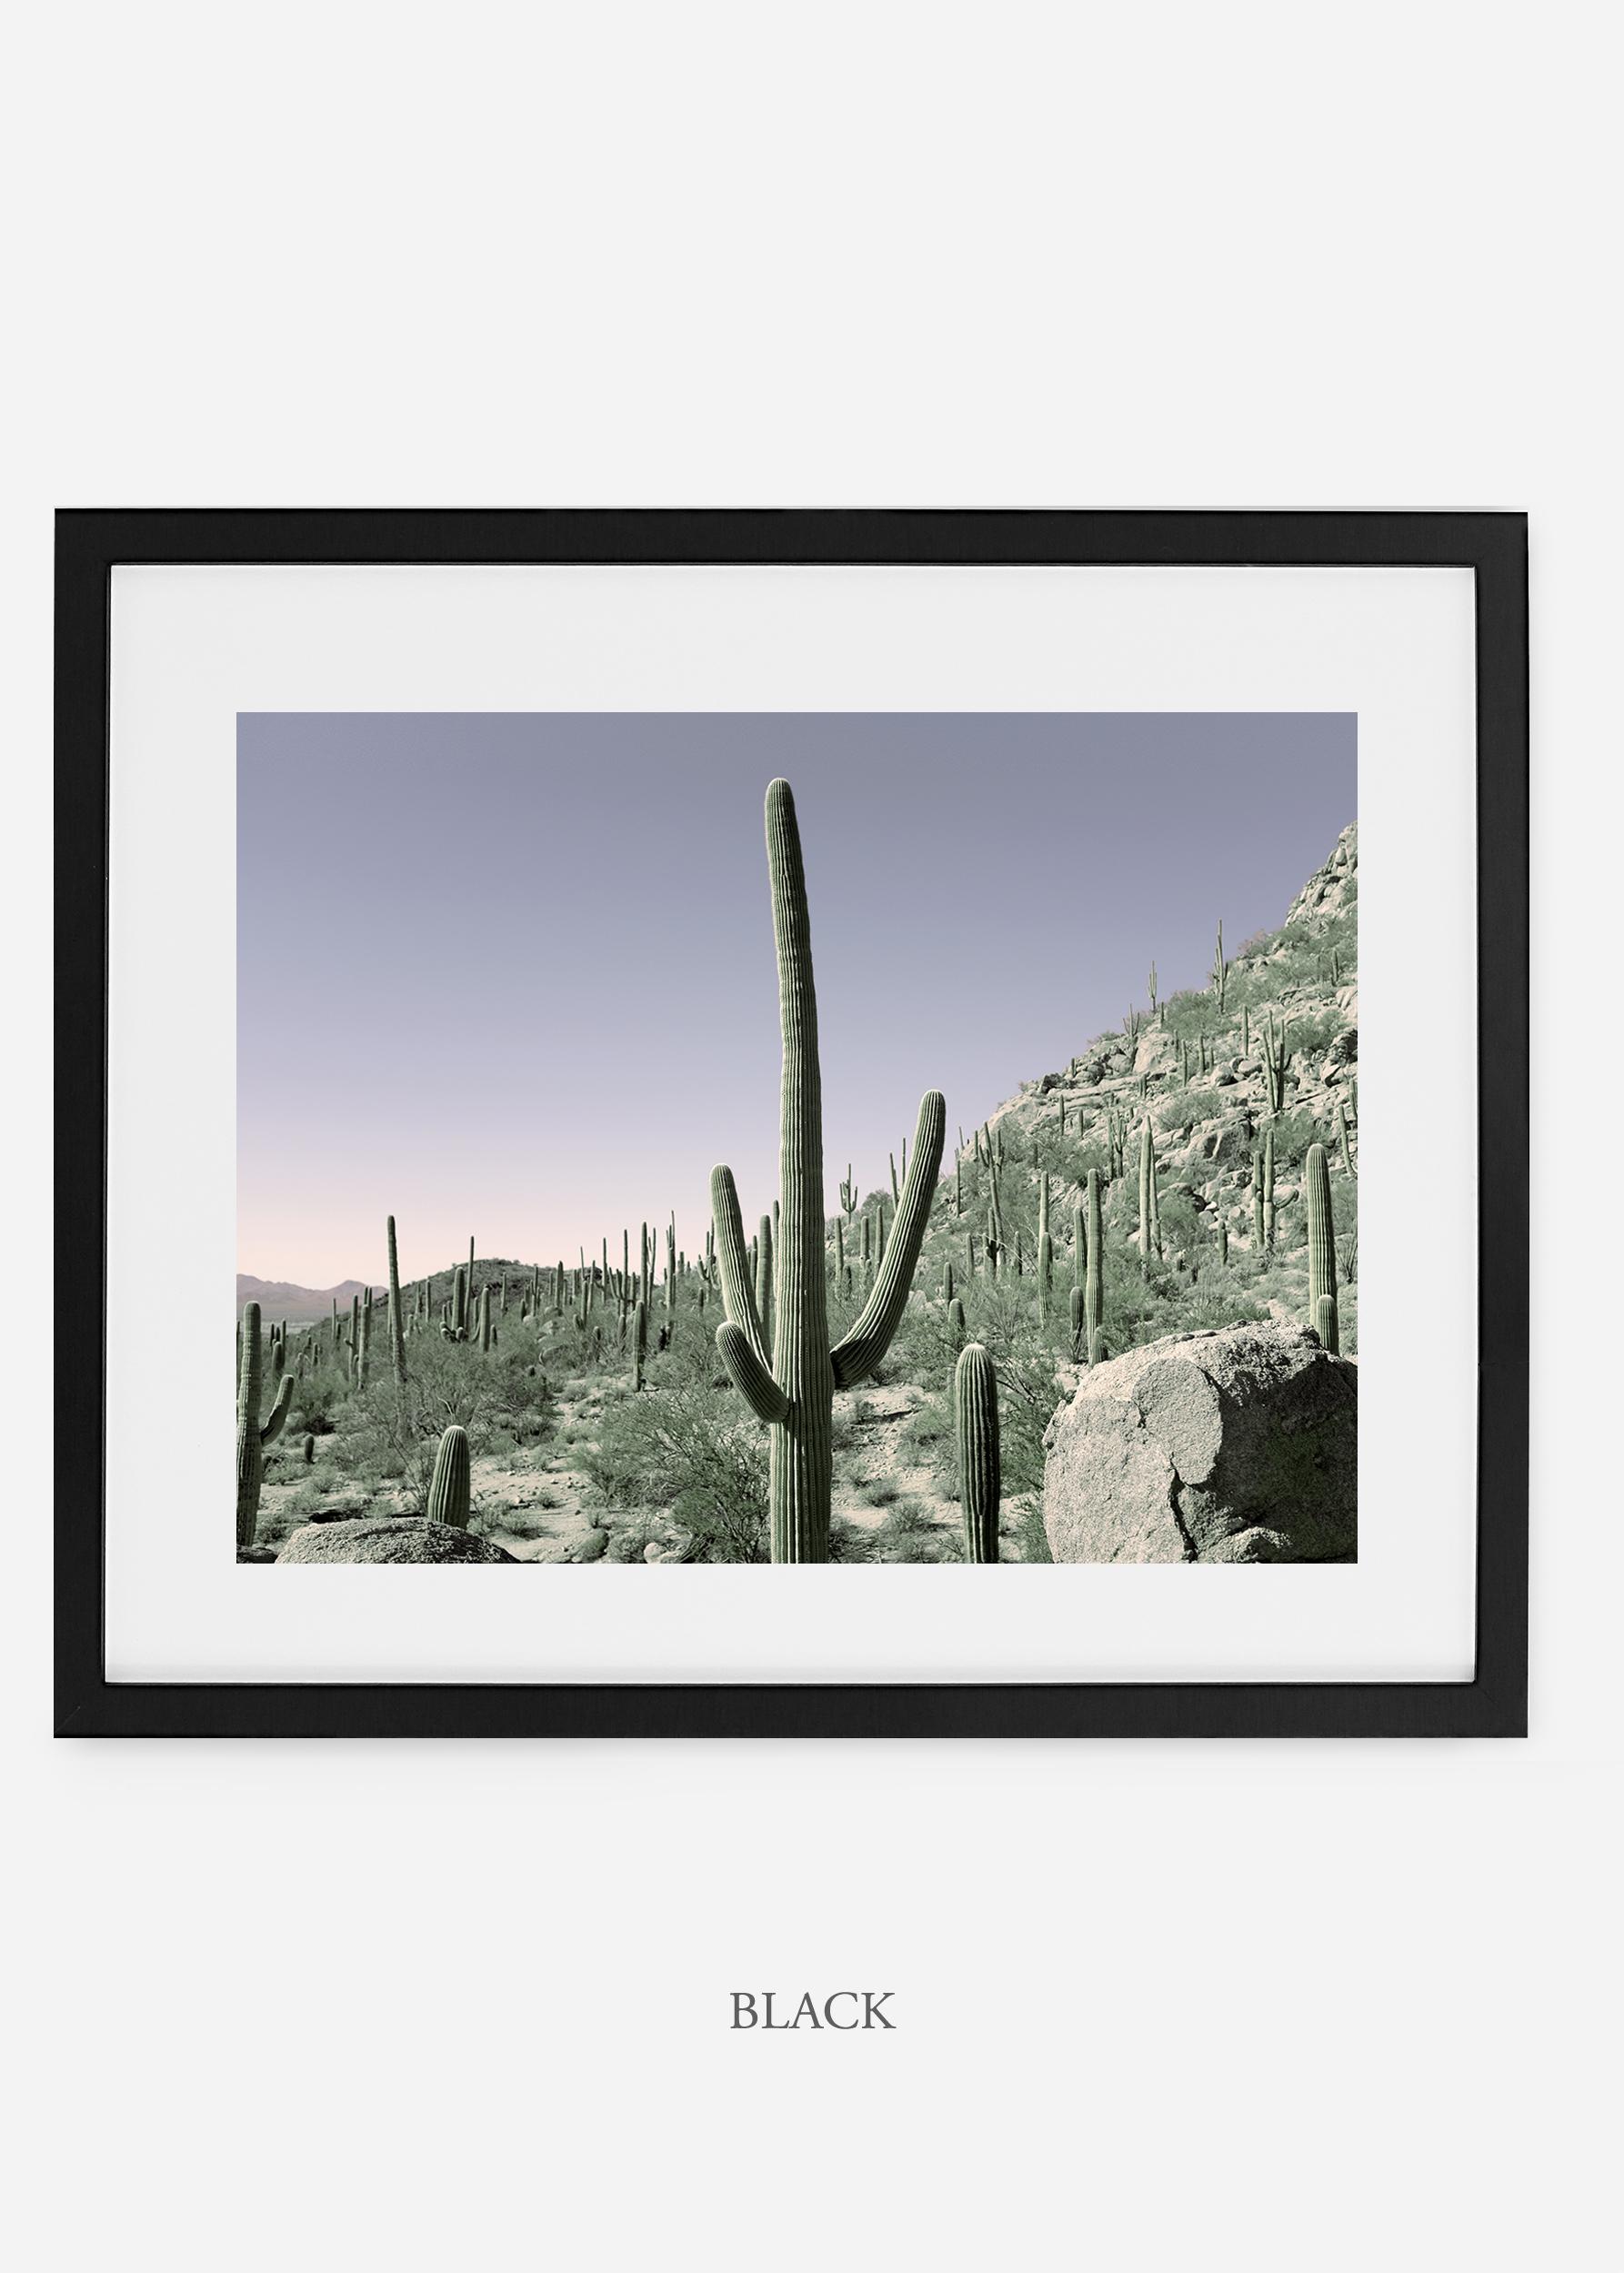 blackframe-saguaroNo.13-wildercalifornia-art-wallart-cactusprint-homedecor-prints-arizona-botanical-artwork-interiordesign.jpg